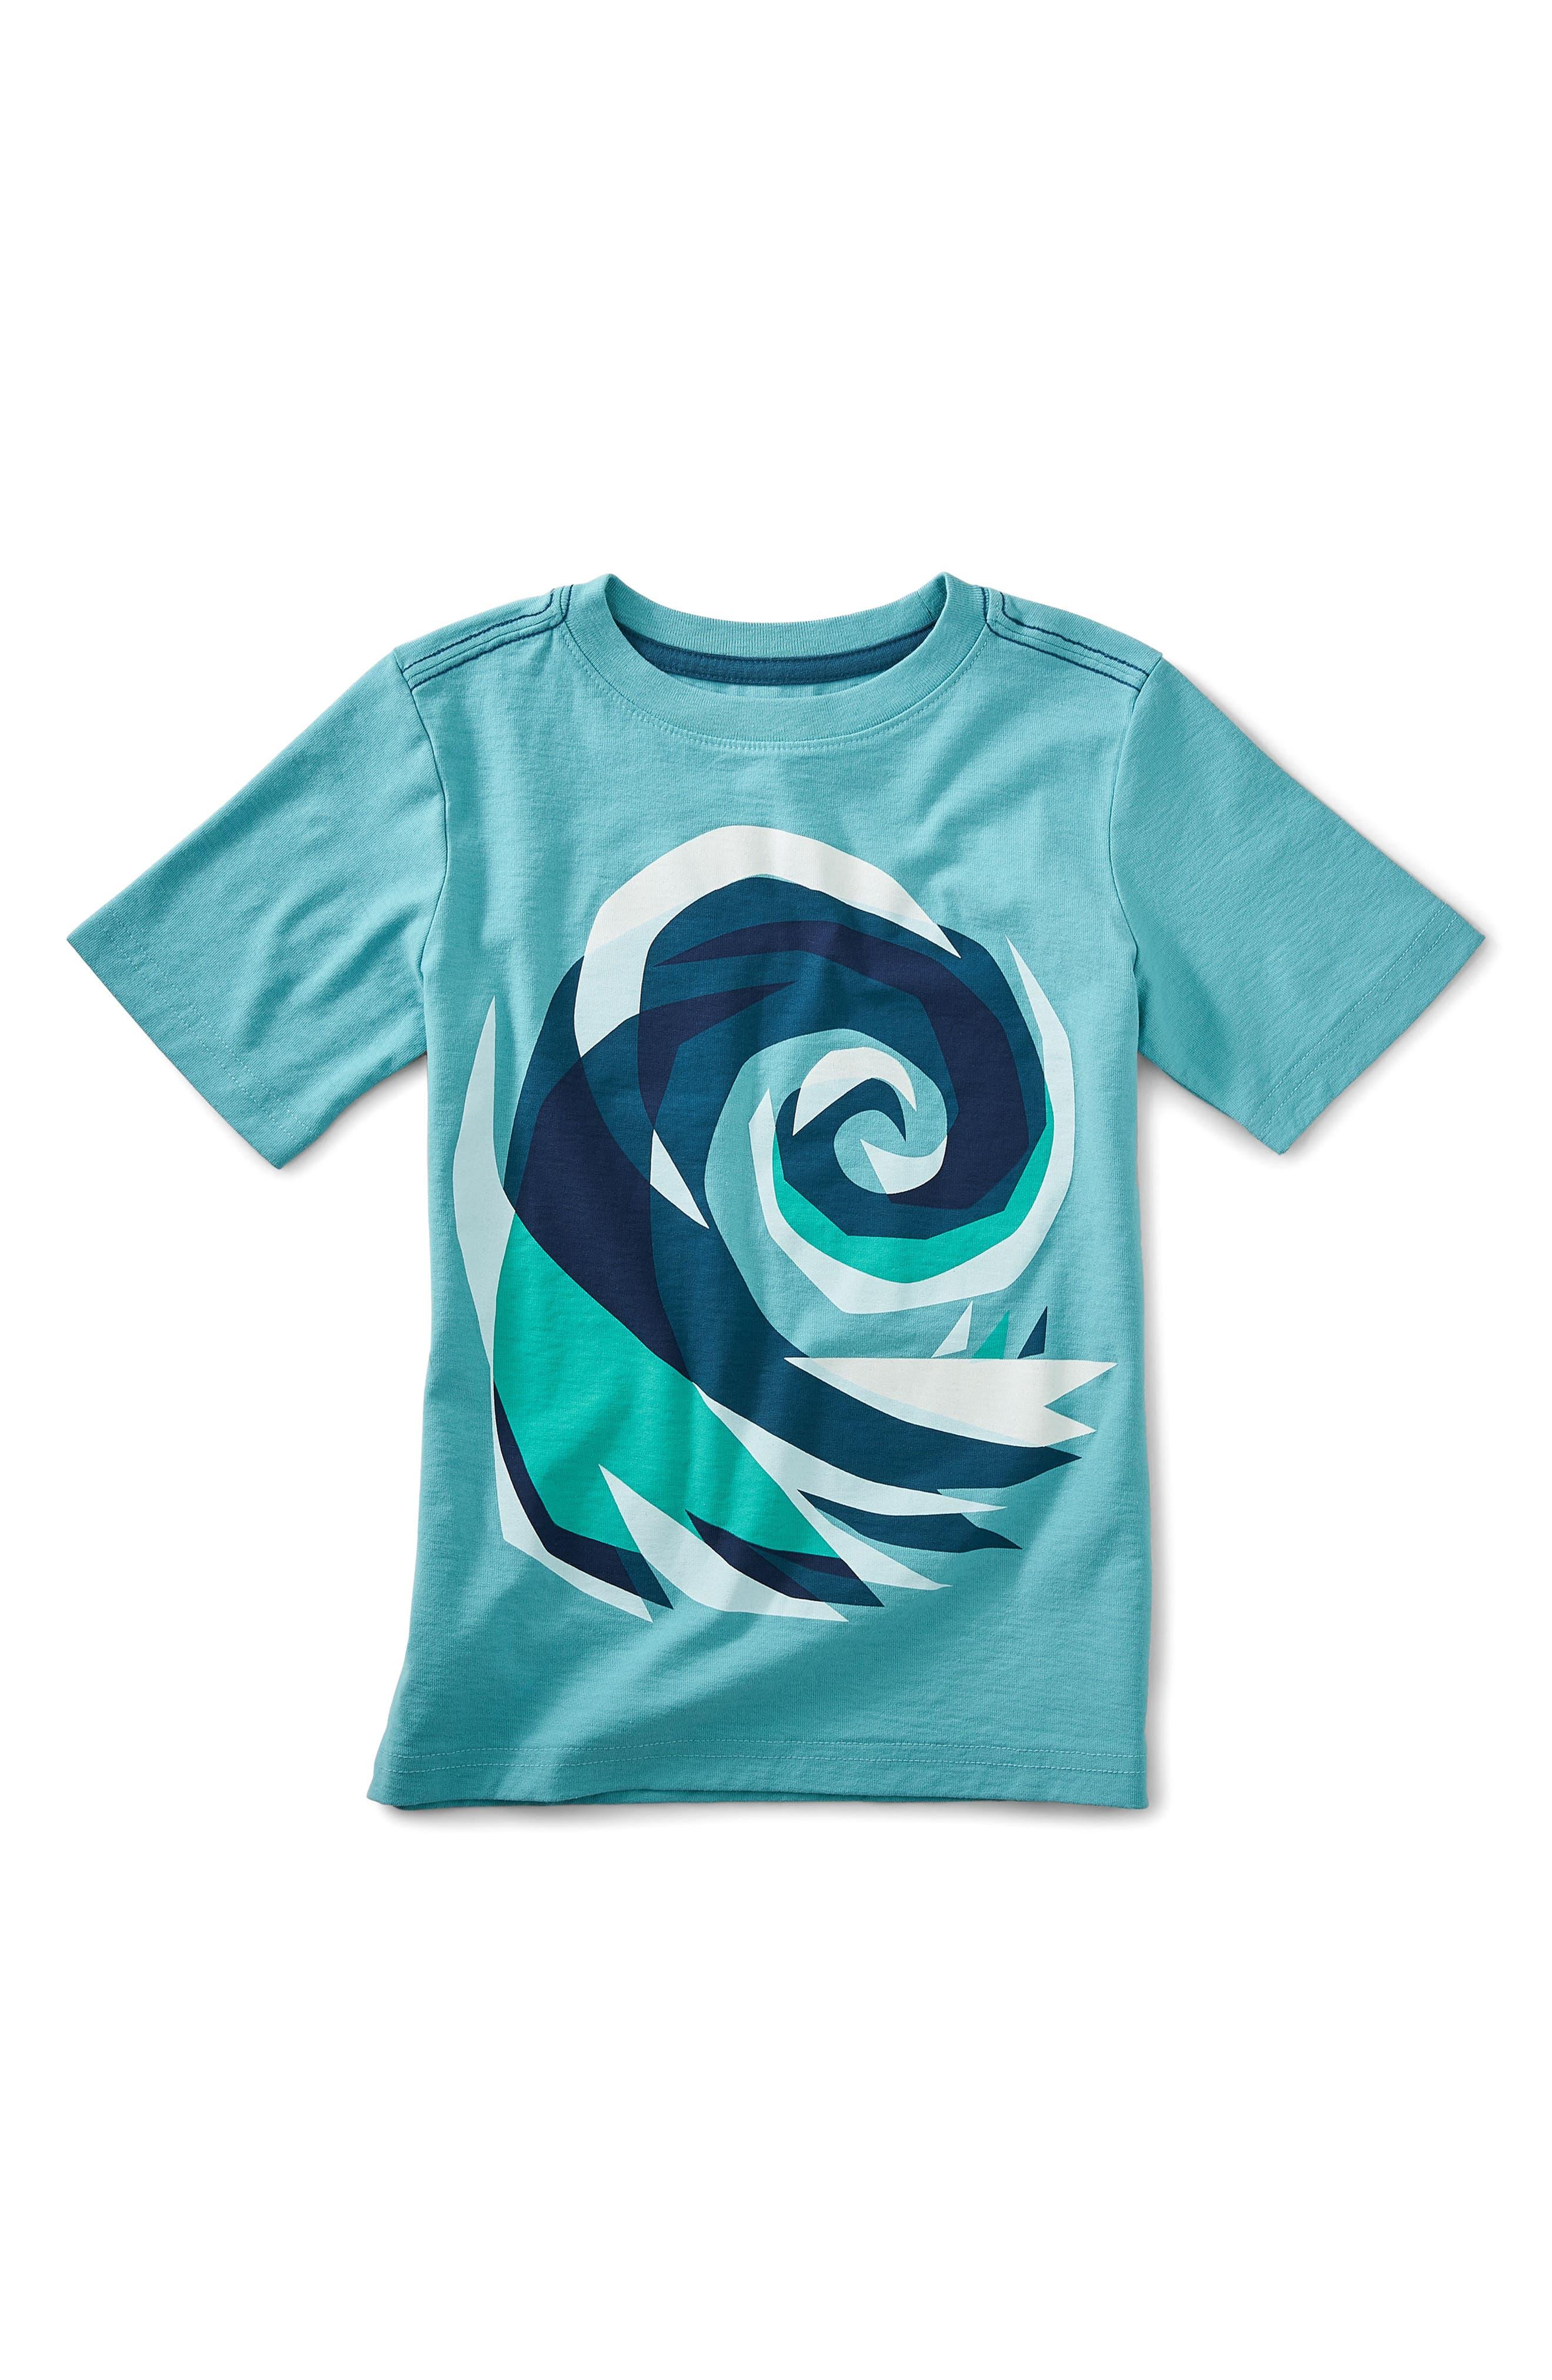 Crashing Wave Graphic T-Shirt,                         Main,                         color, 473